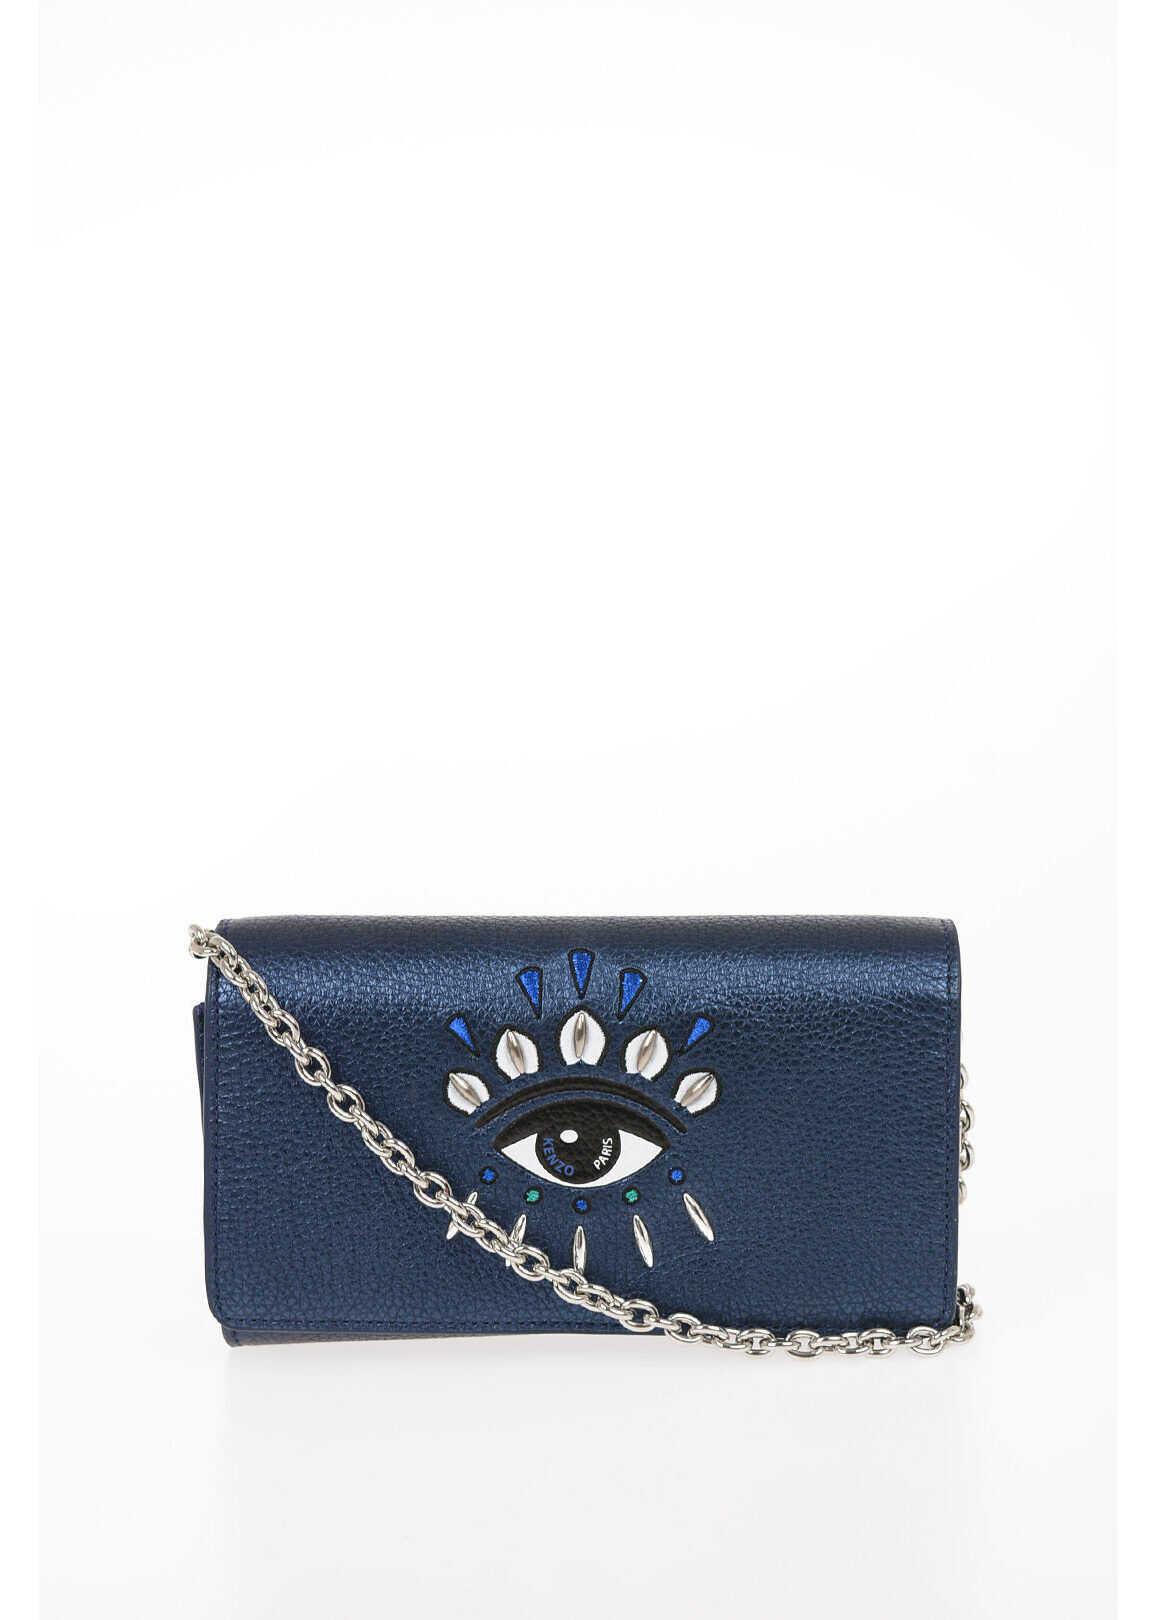 Kenzo Textured Leather Mini Crossbody Bag With Jewel Details BLUE imagine b-mall.ro